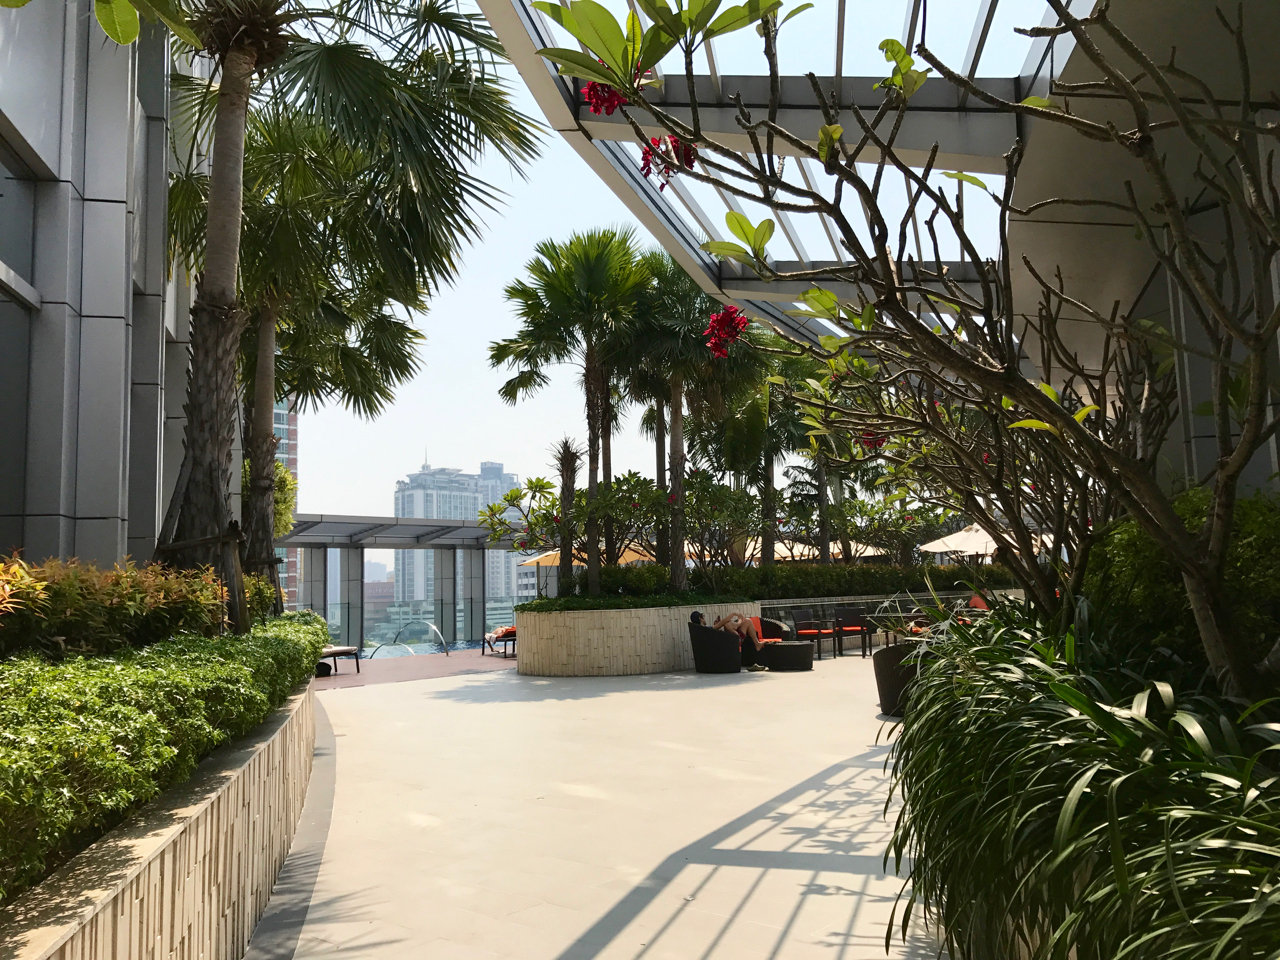 Bangkok Marriott Sukhumvit Hotel review, the pool area